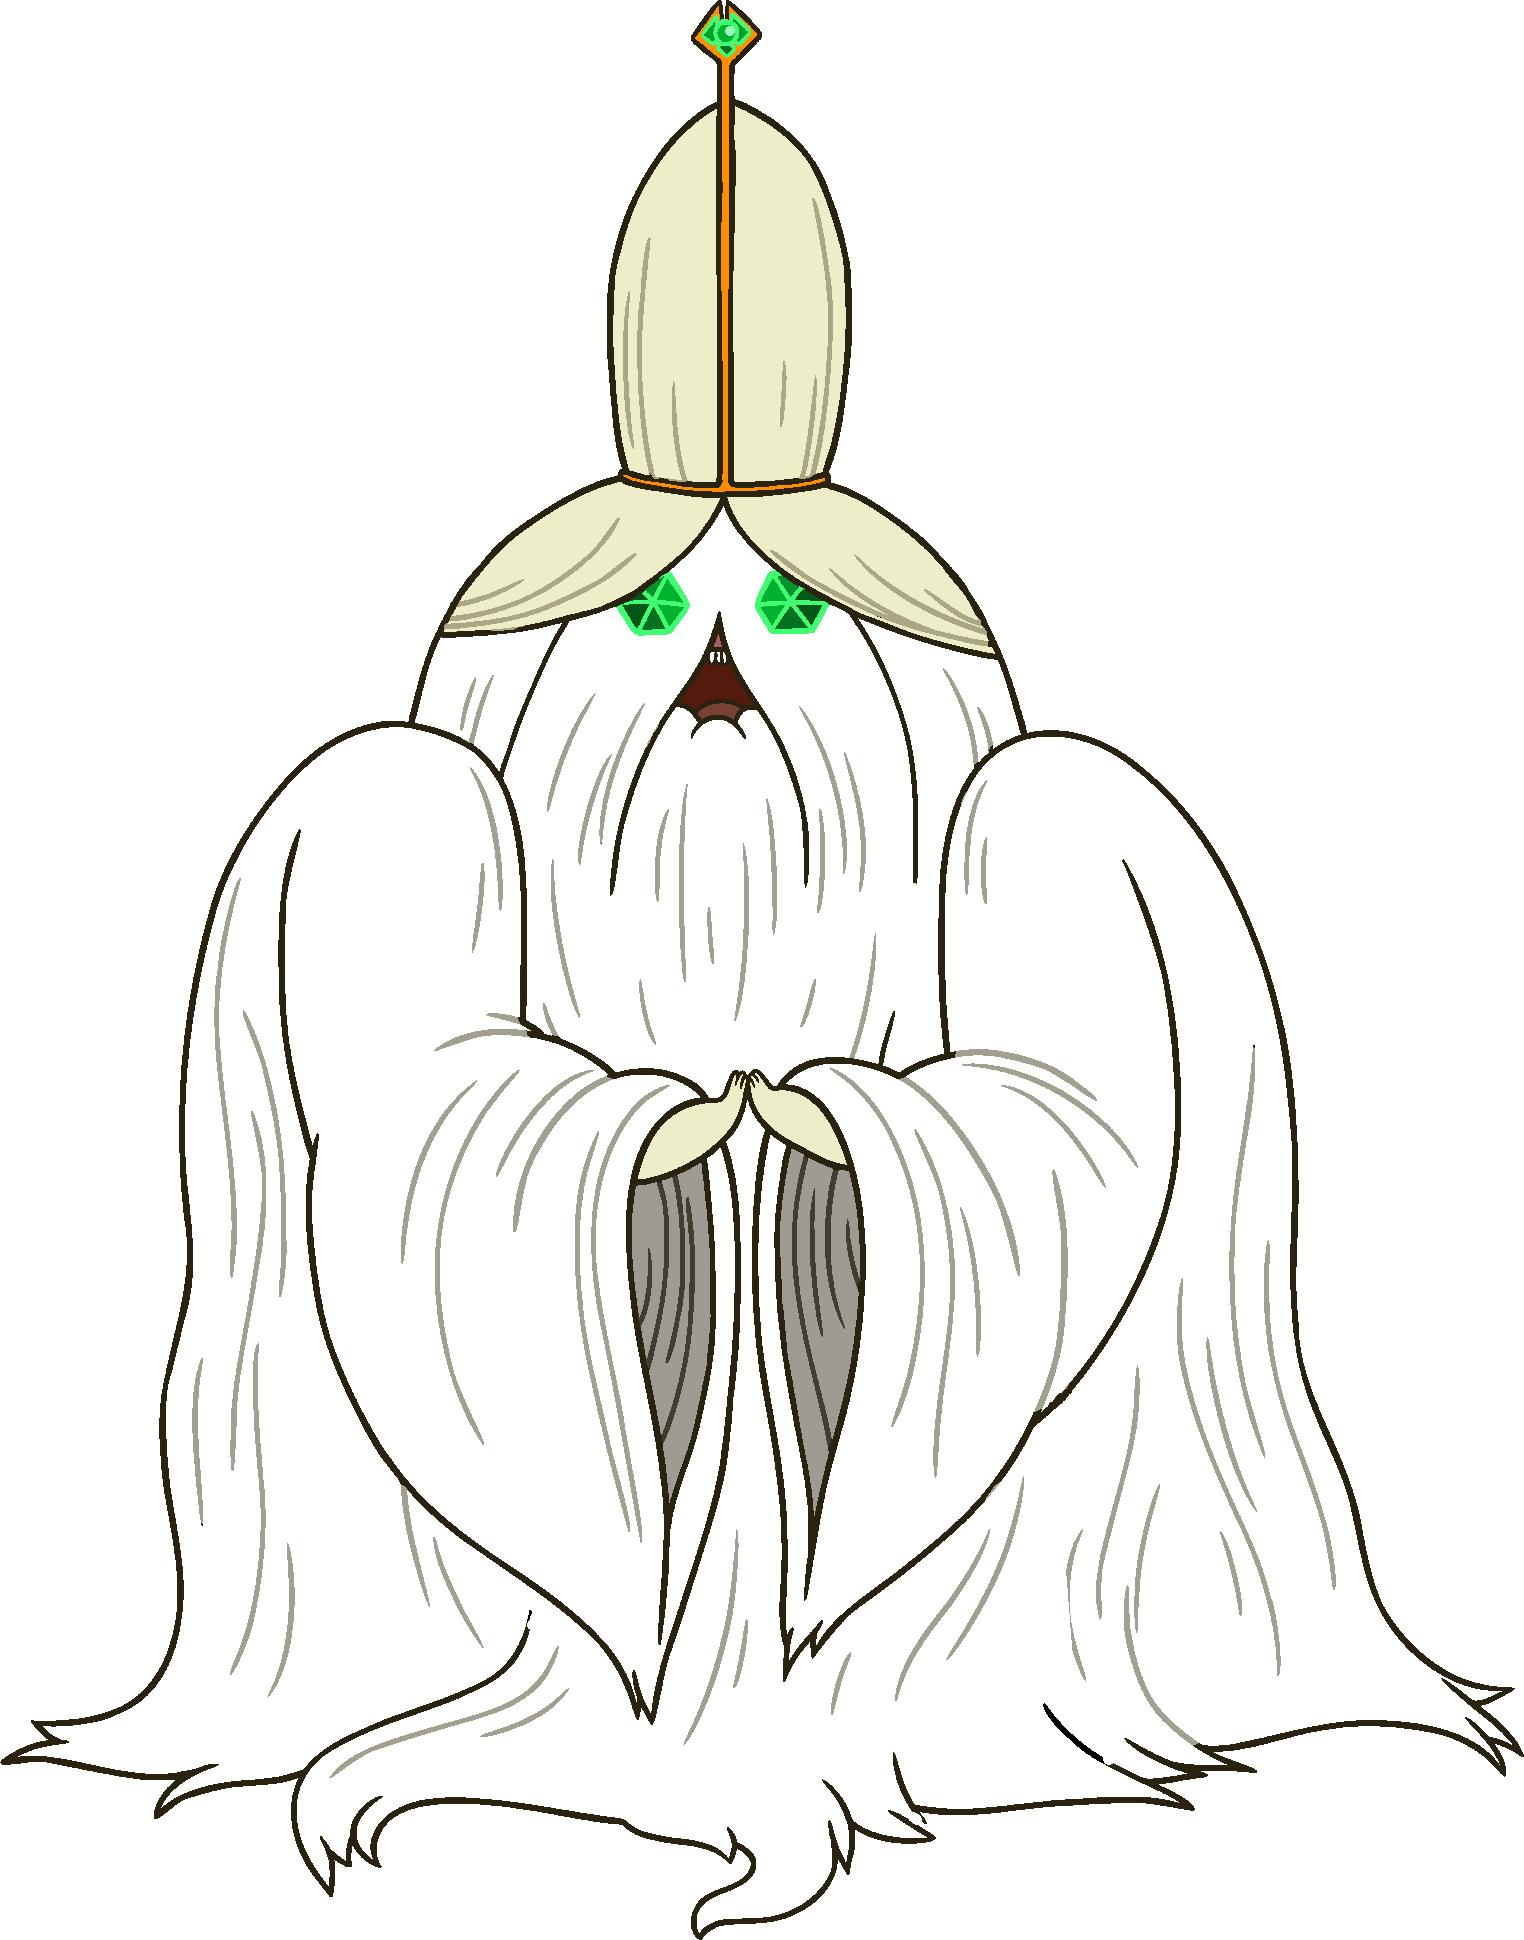 Grand Master Wizard.